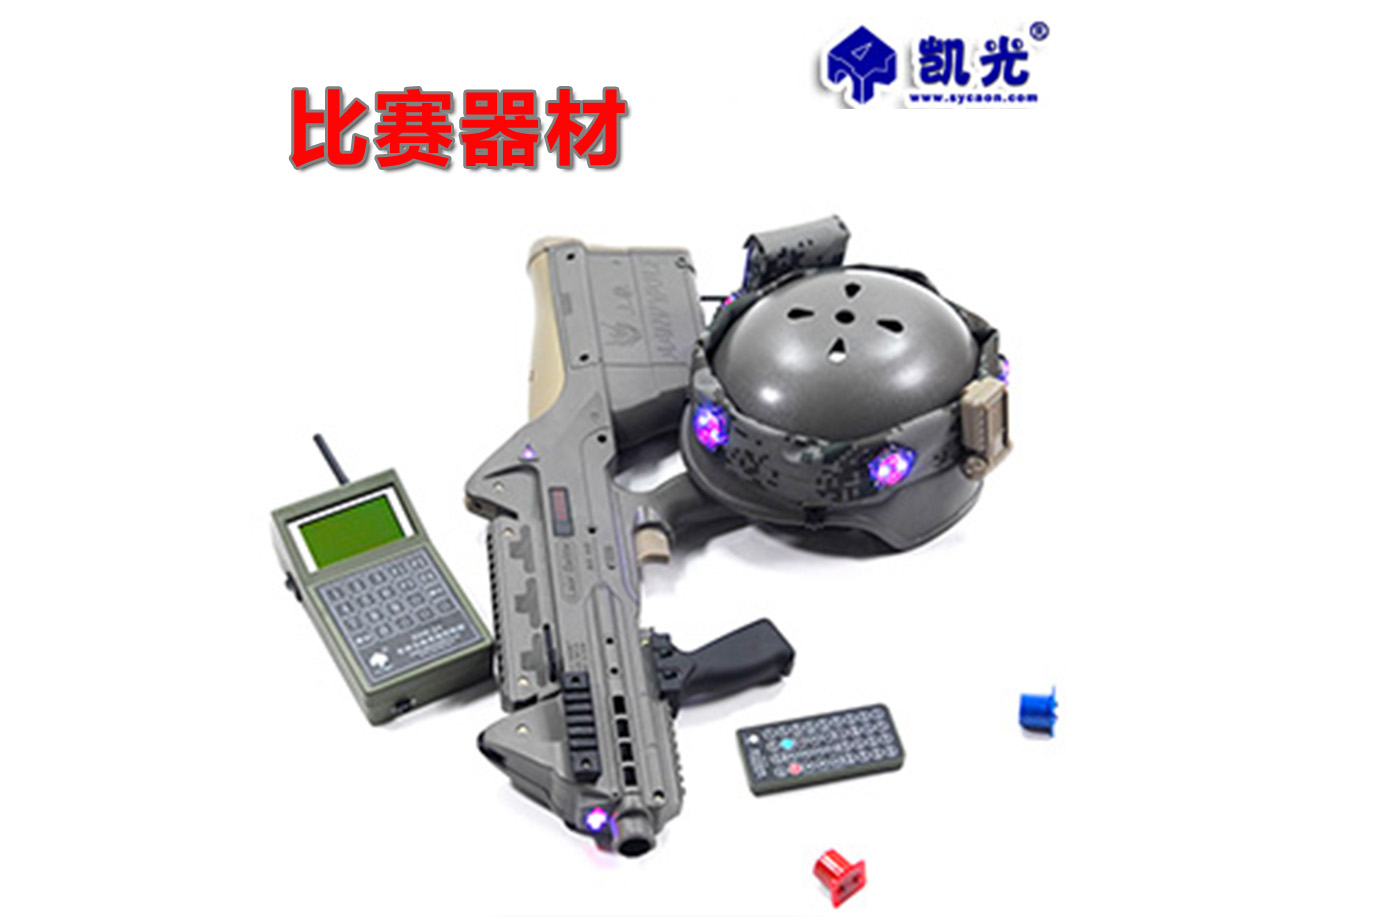 DK2000競技版野戰運動專用器材